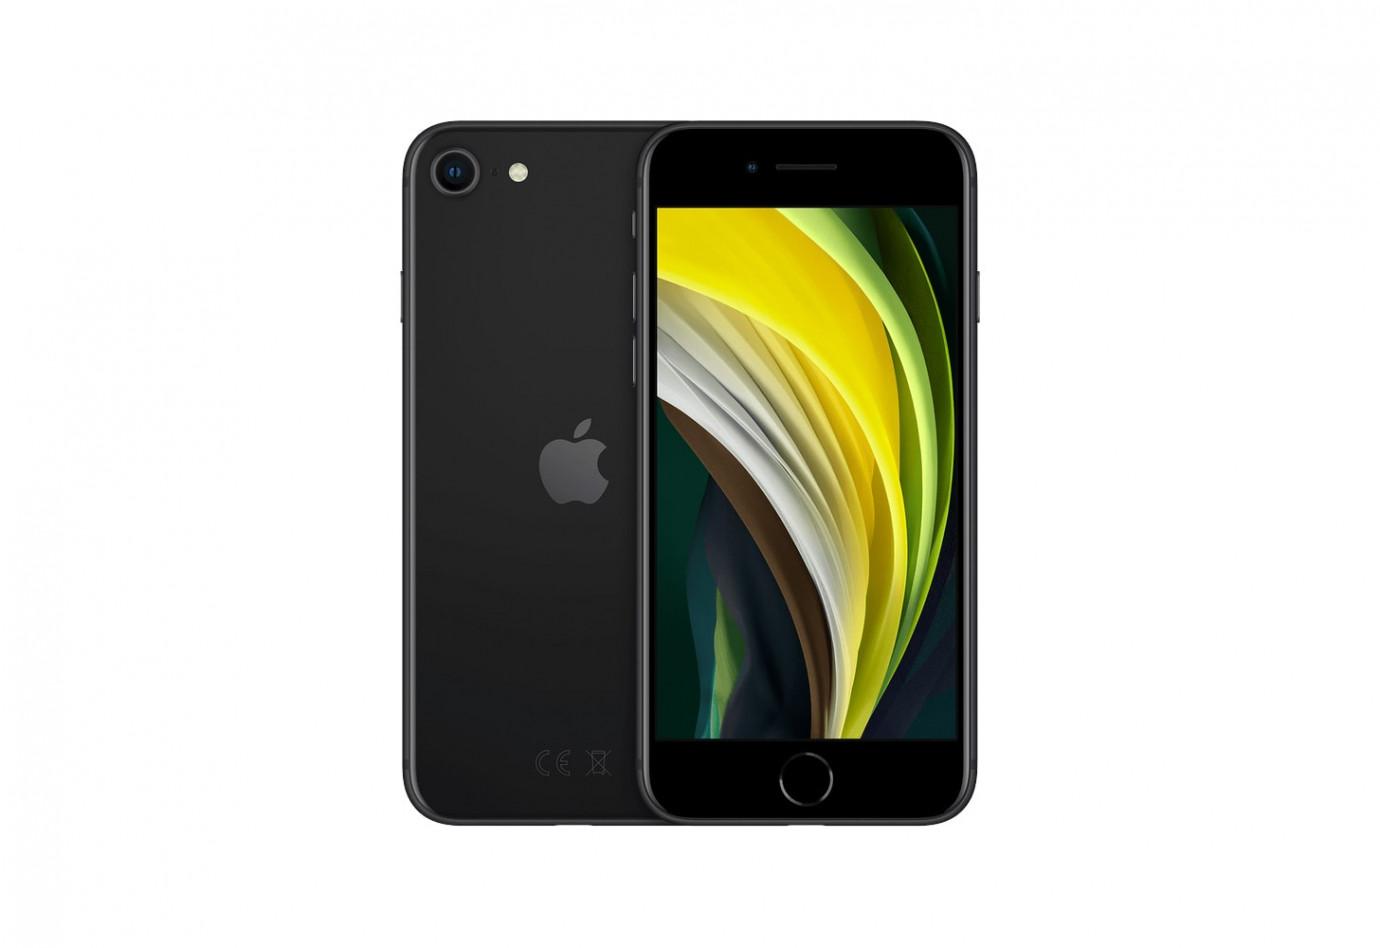 iphone-SE-black.jpg